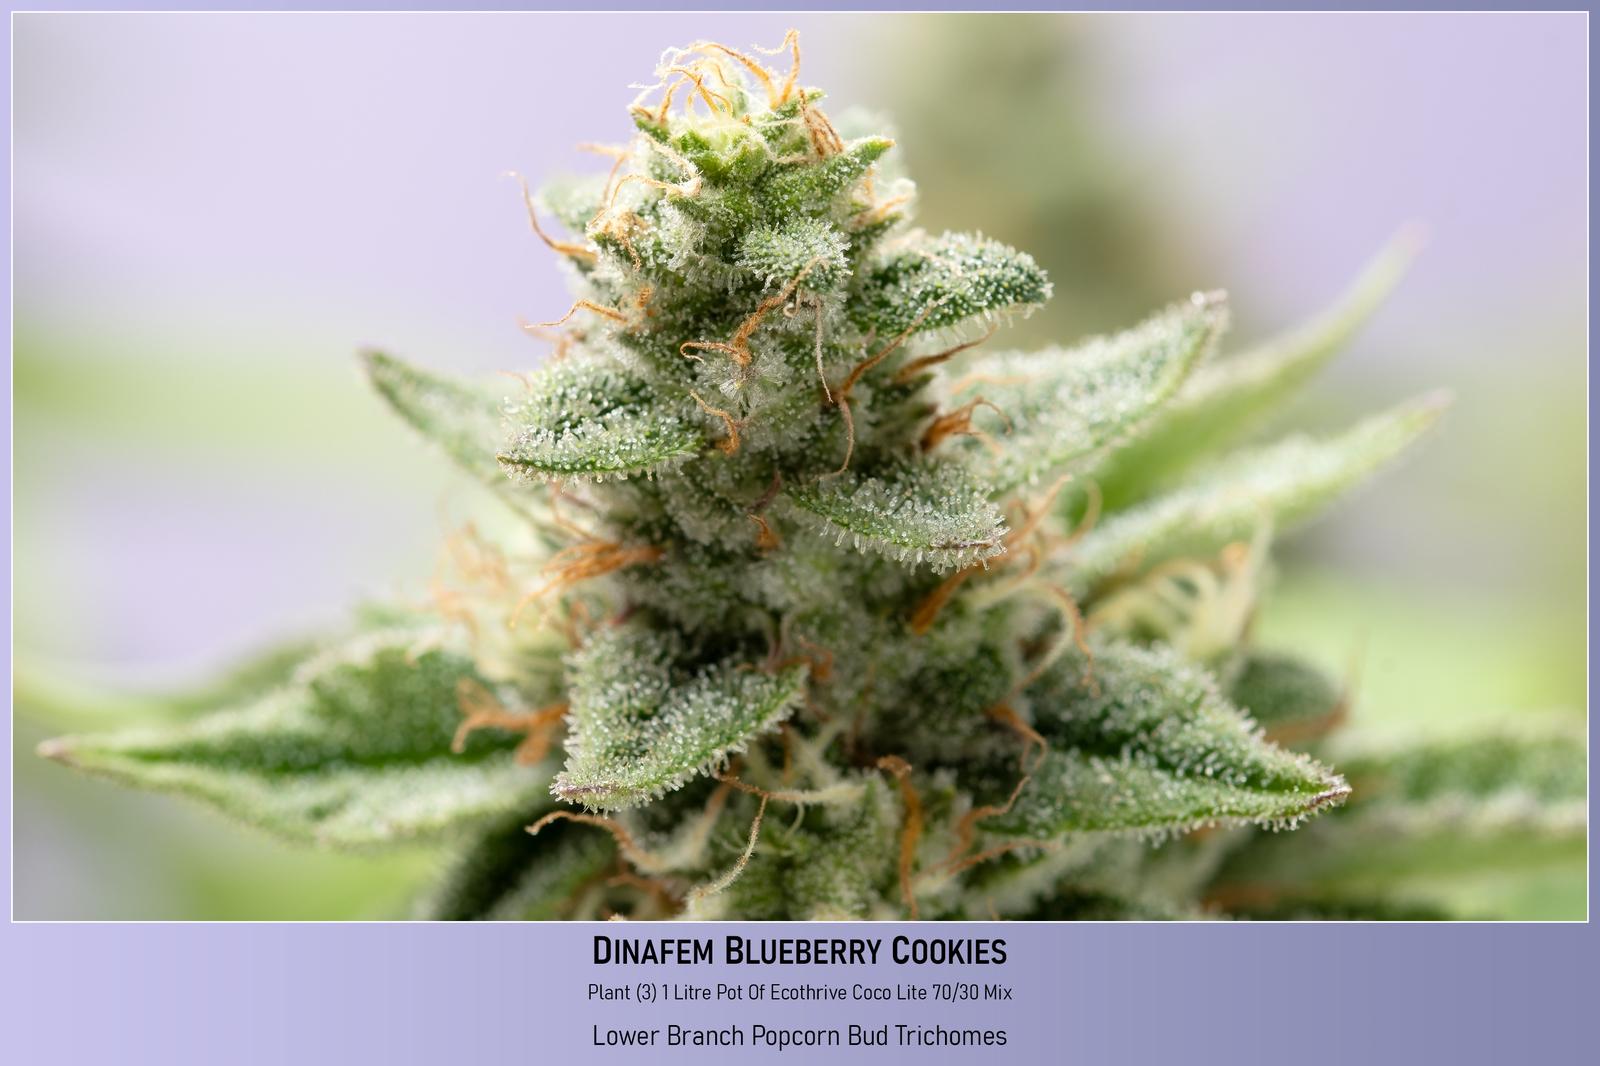 large.6034f901e8b0e_Dinafem-BlueBerryCookies-Plant3-1LitrePotOfCocoPerlite-RandomBudImage-23-02-2021.jpg